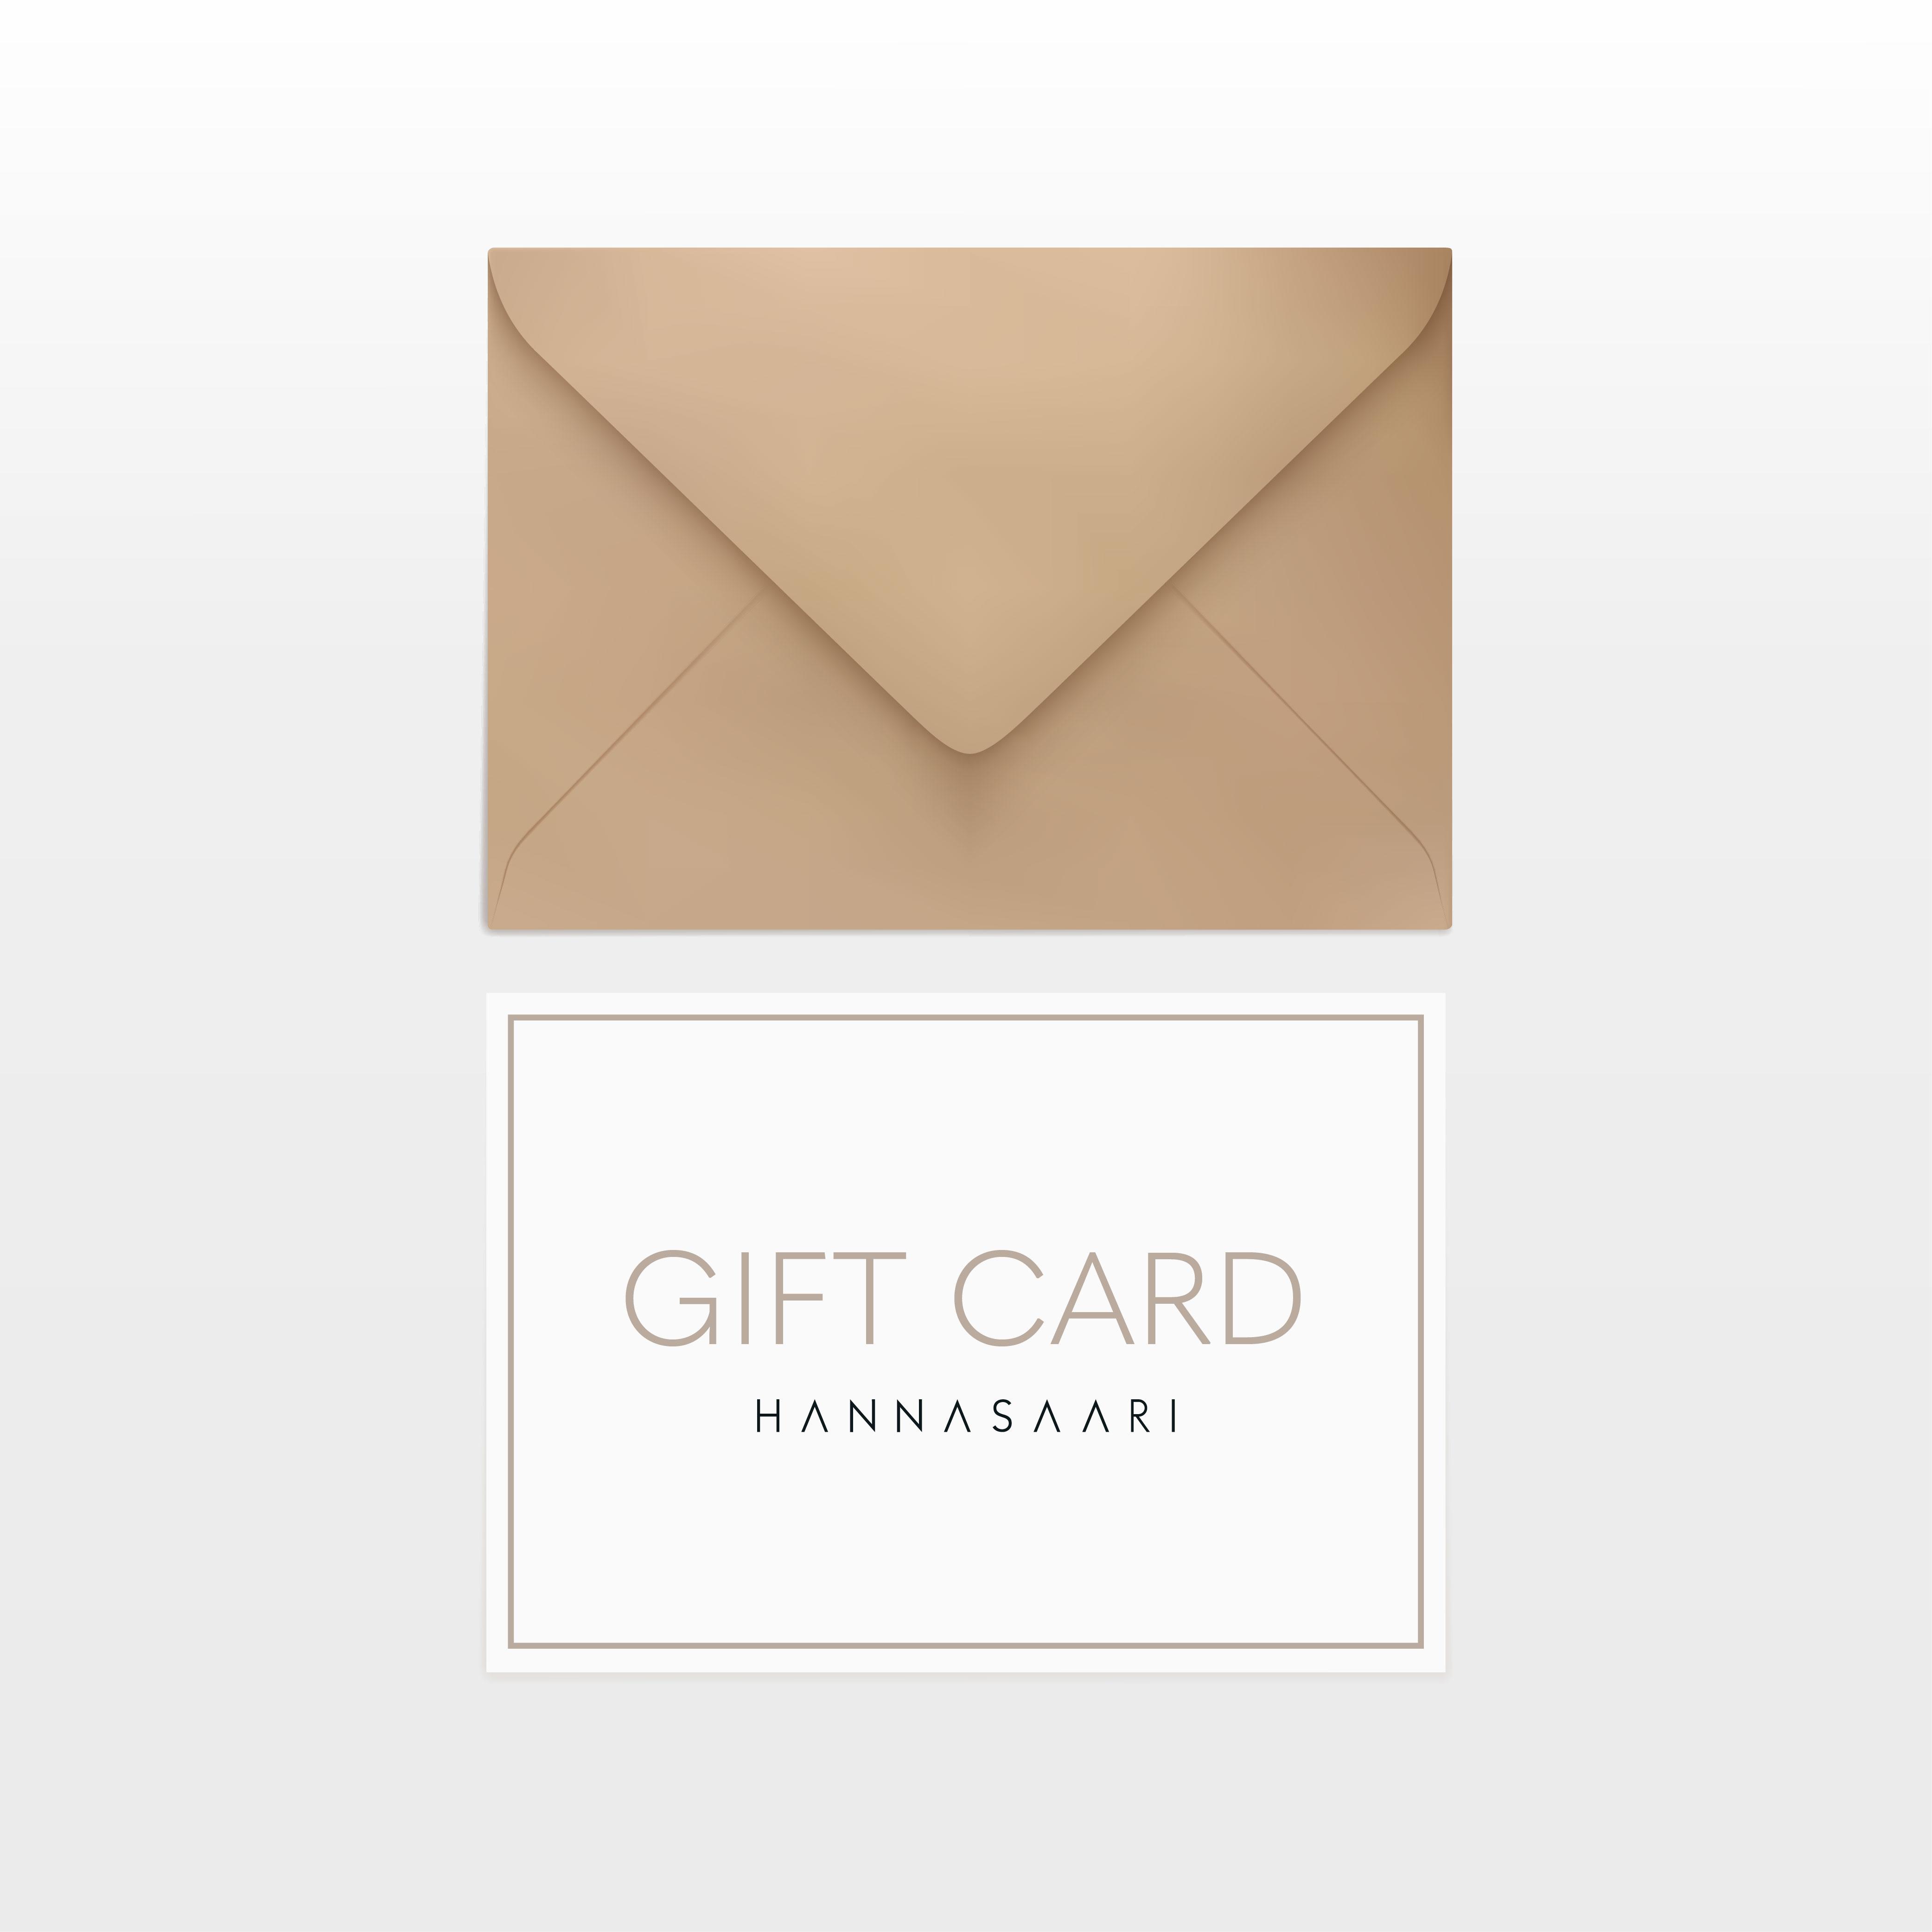 GIFT CARD - lahjakortti